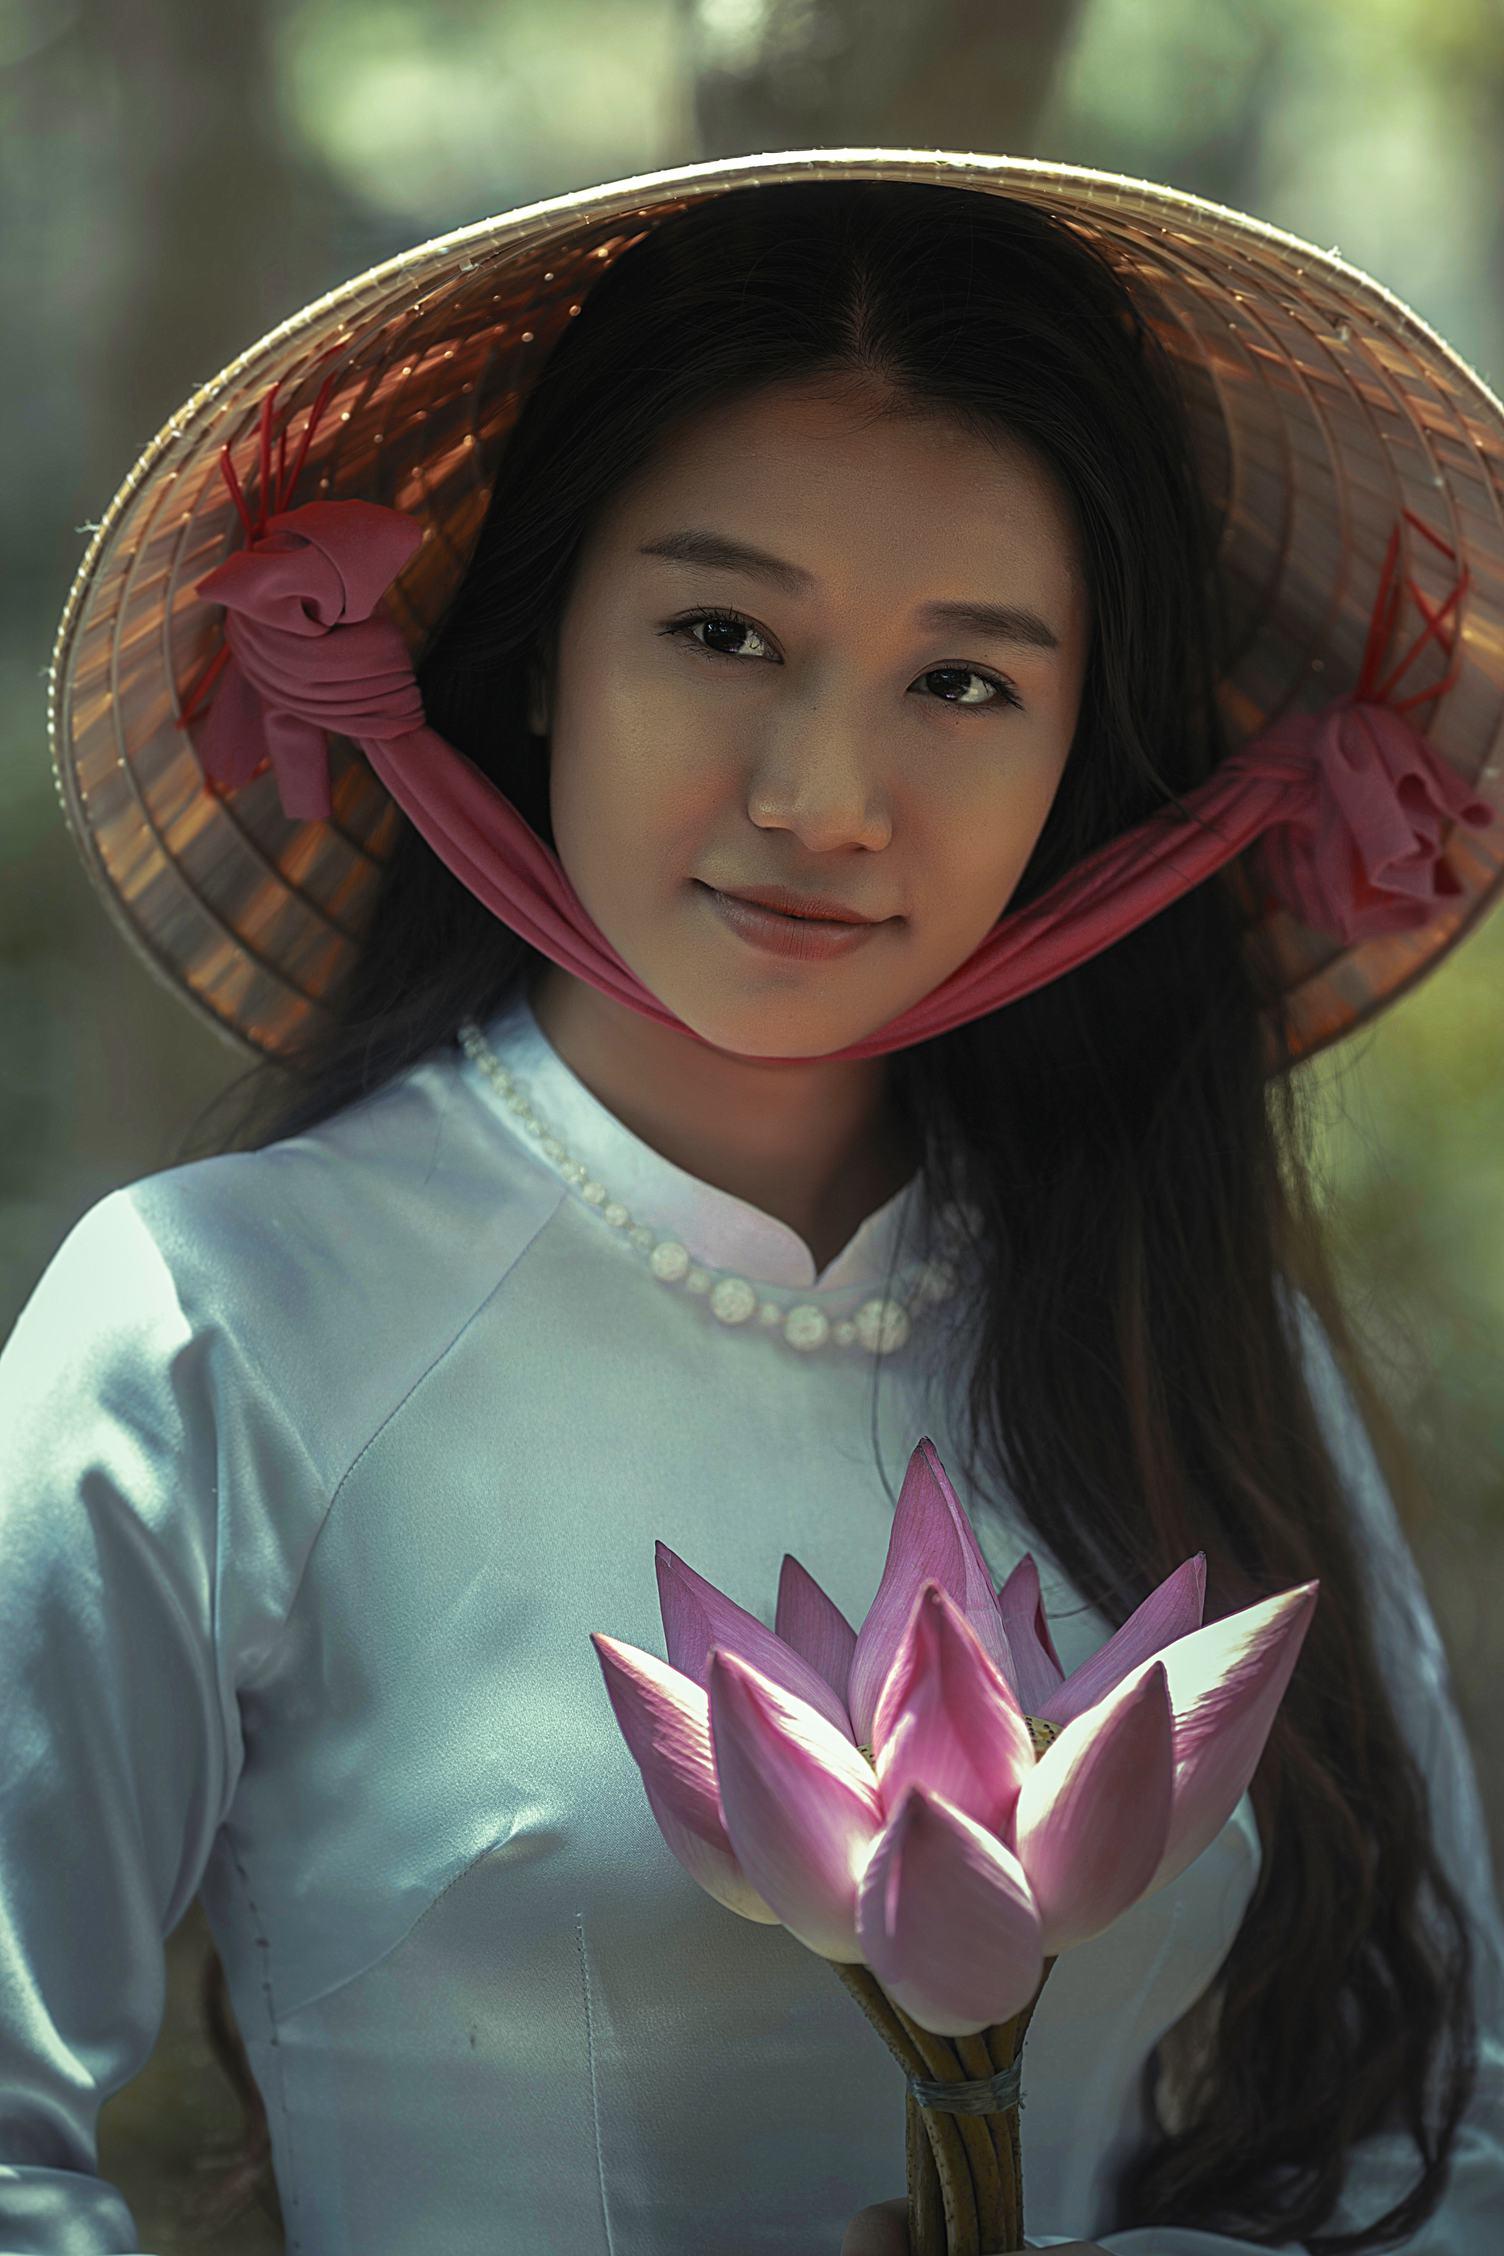 Vietnam Girl with Flowers